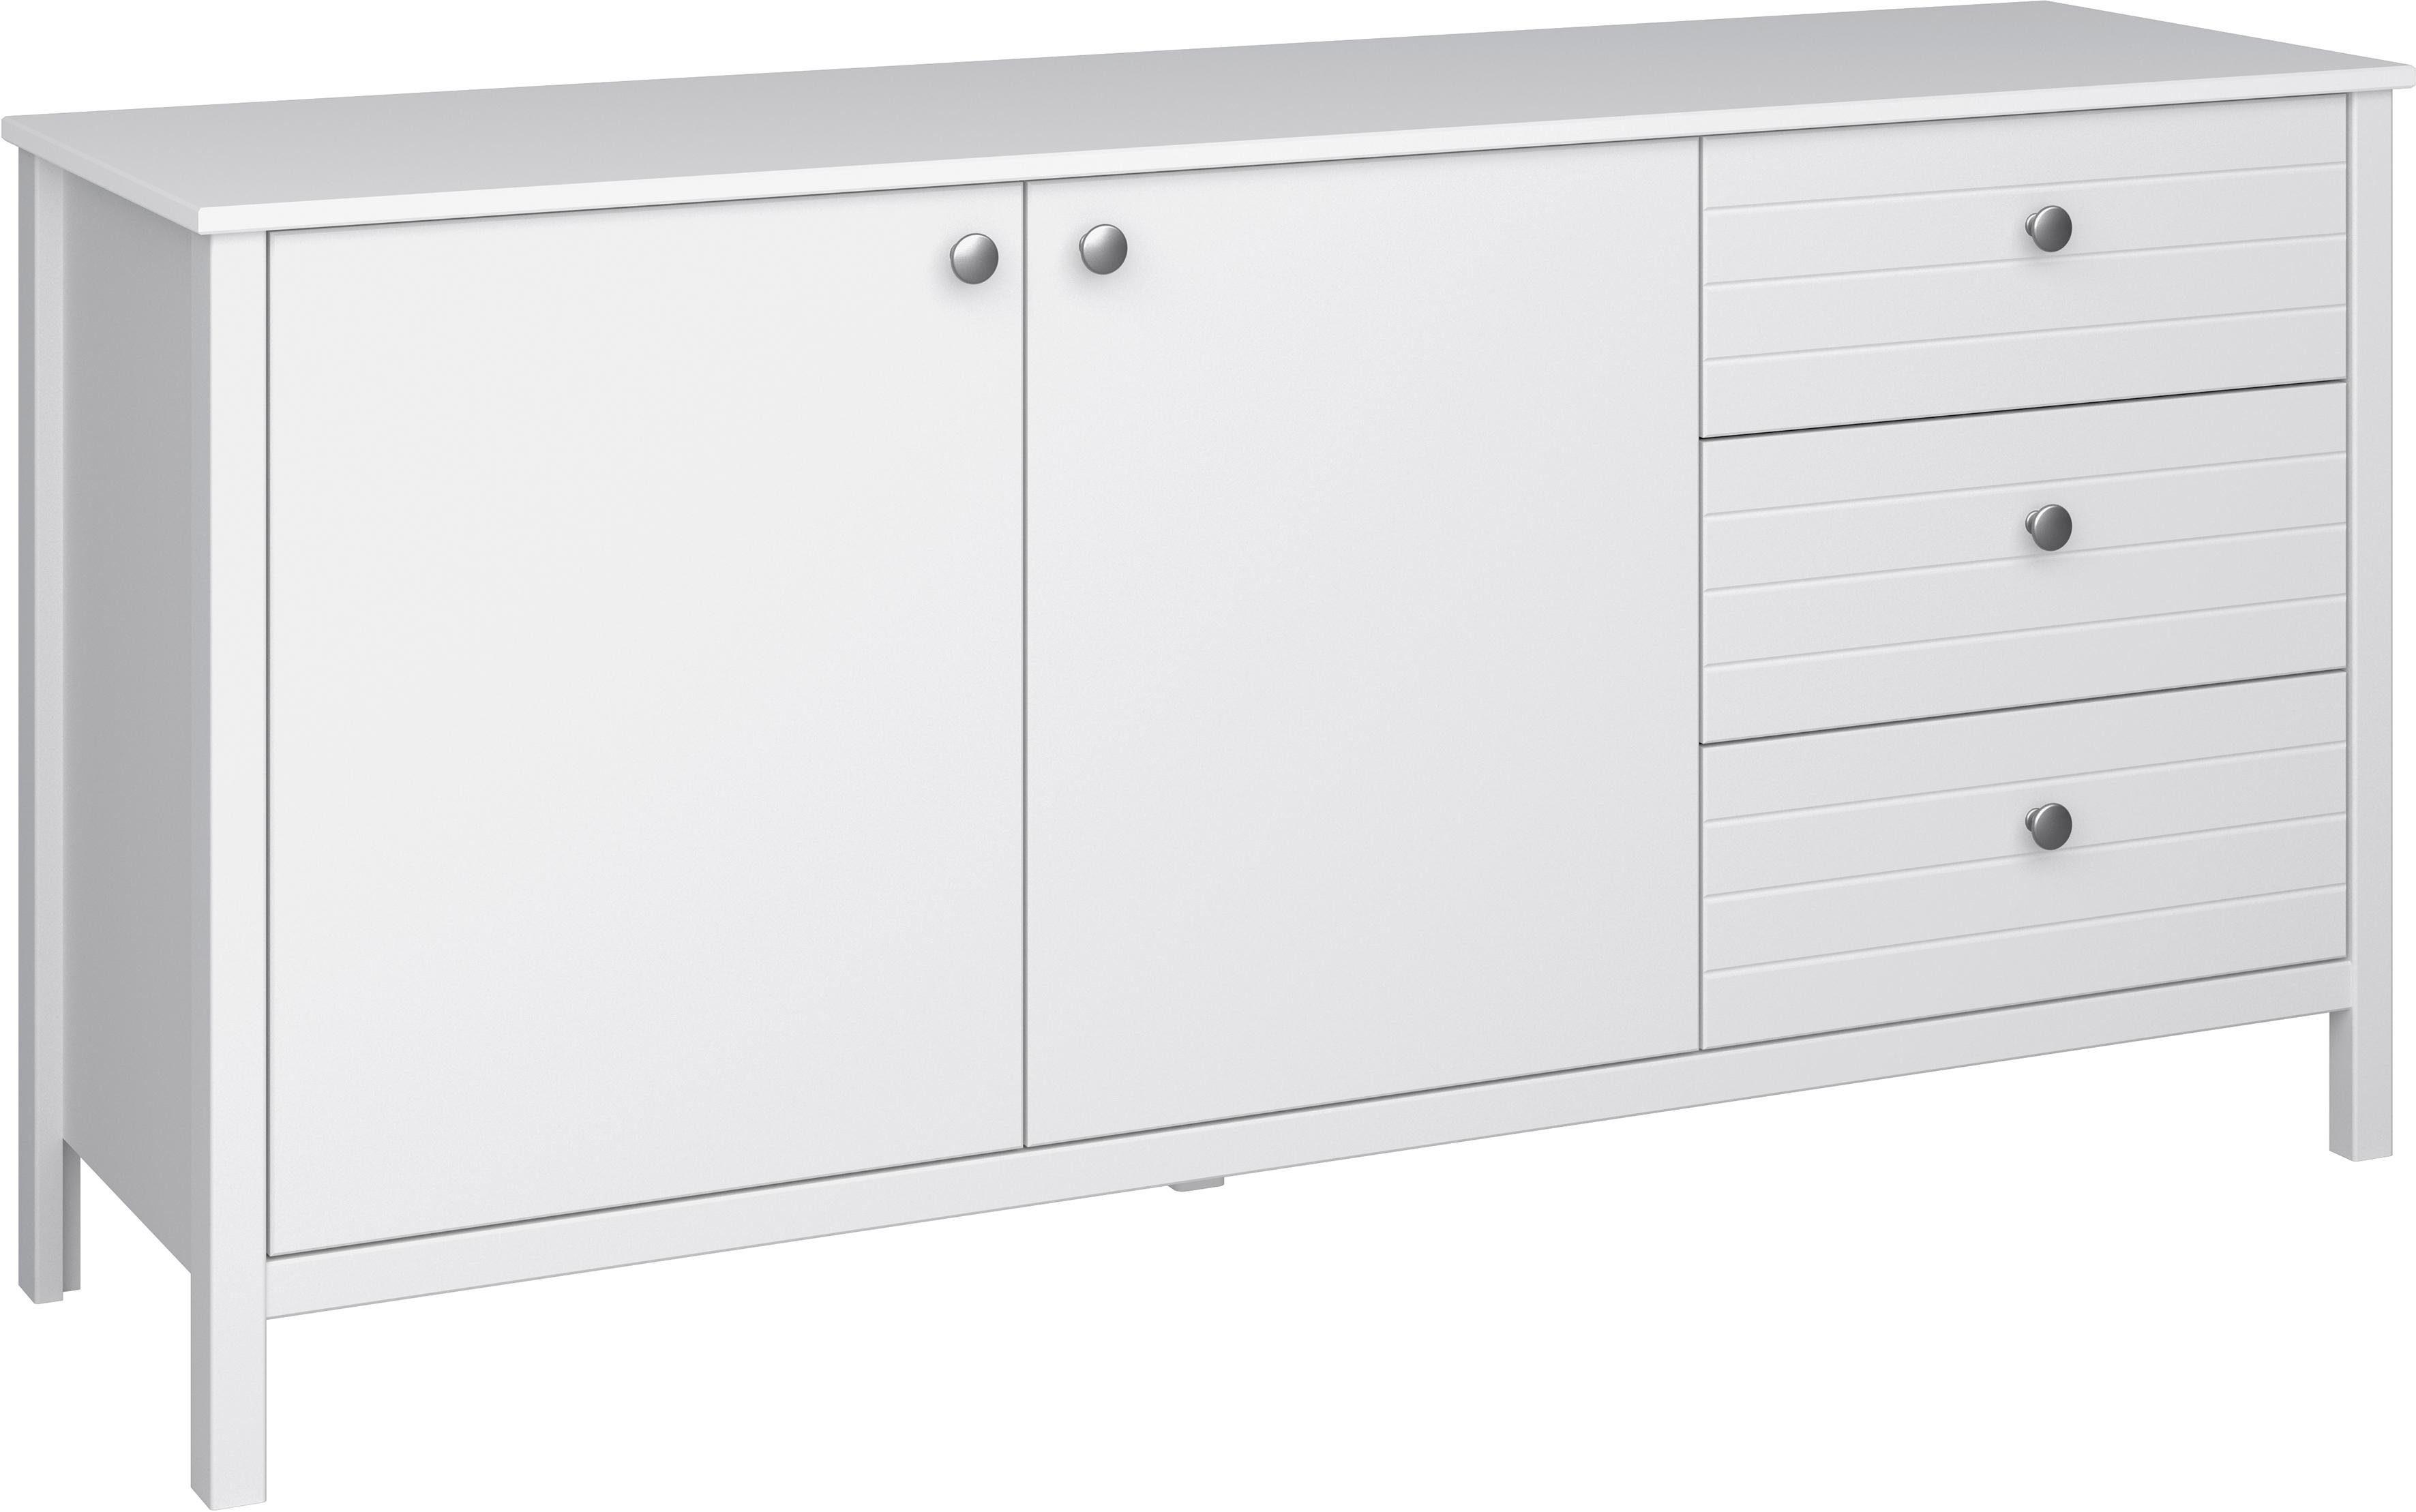 Home affaire Sideboard »New York«, Breite 150 cm